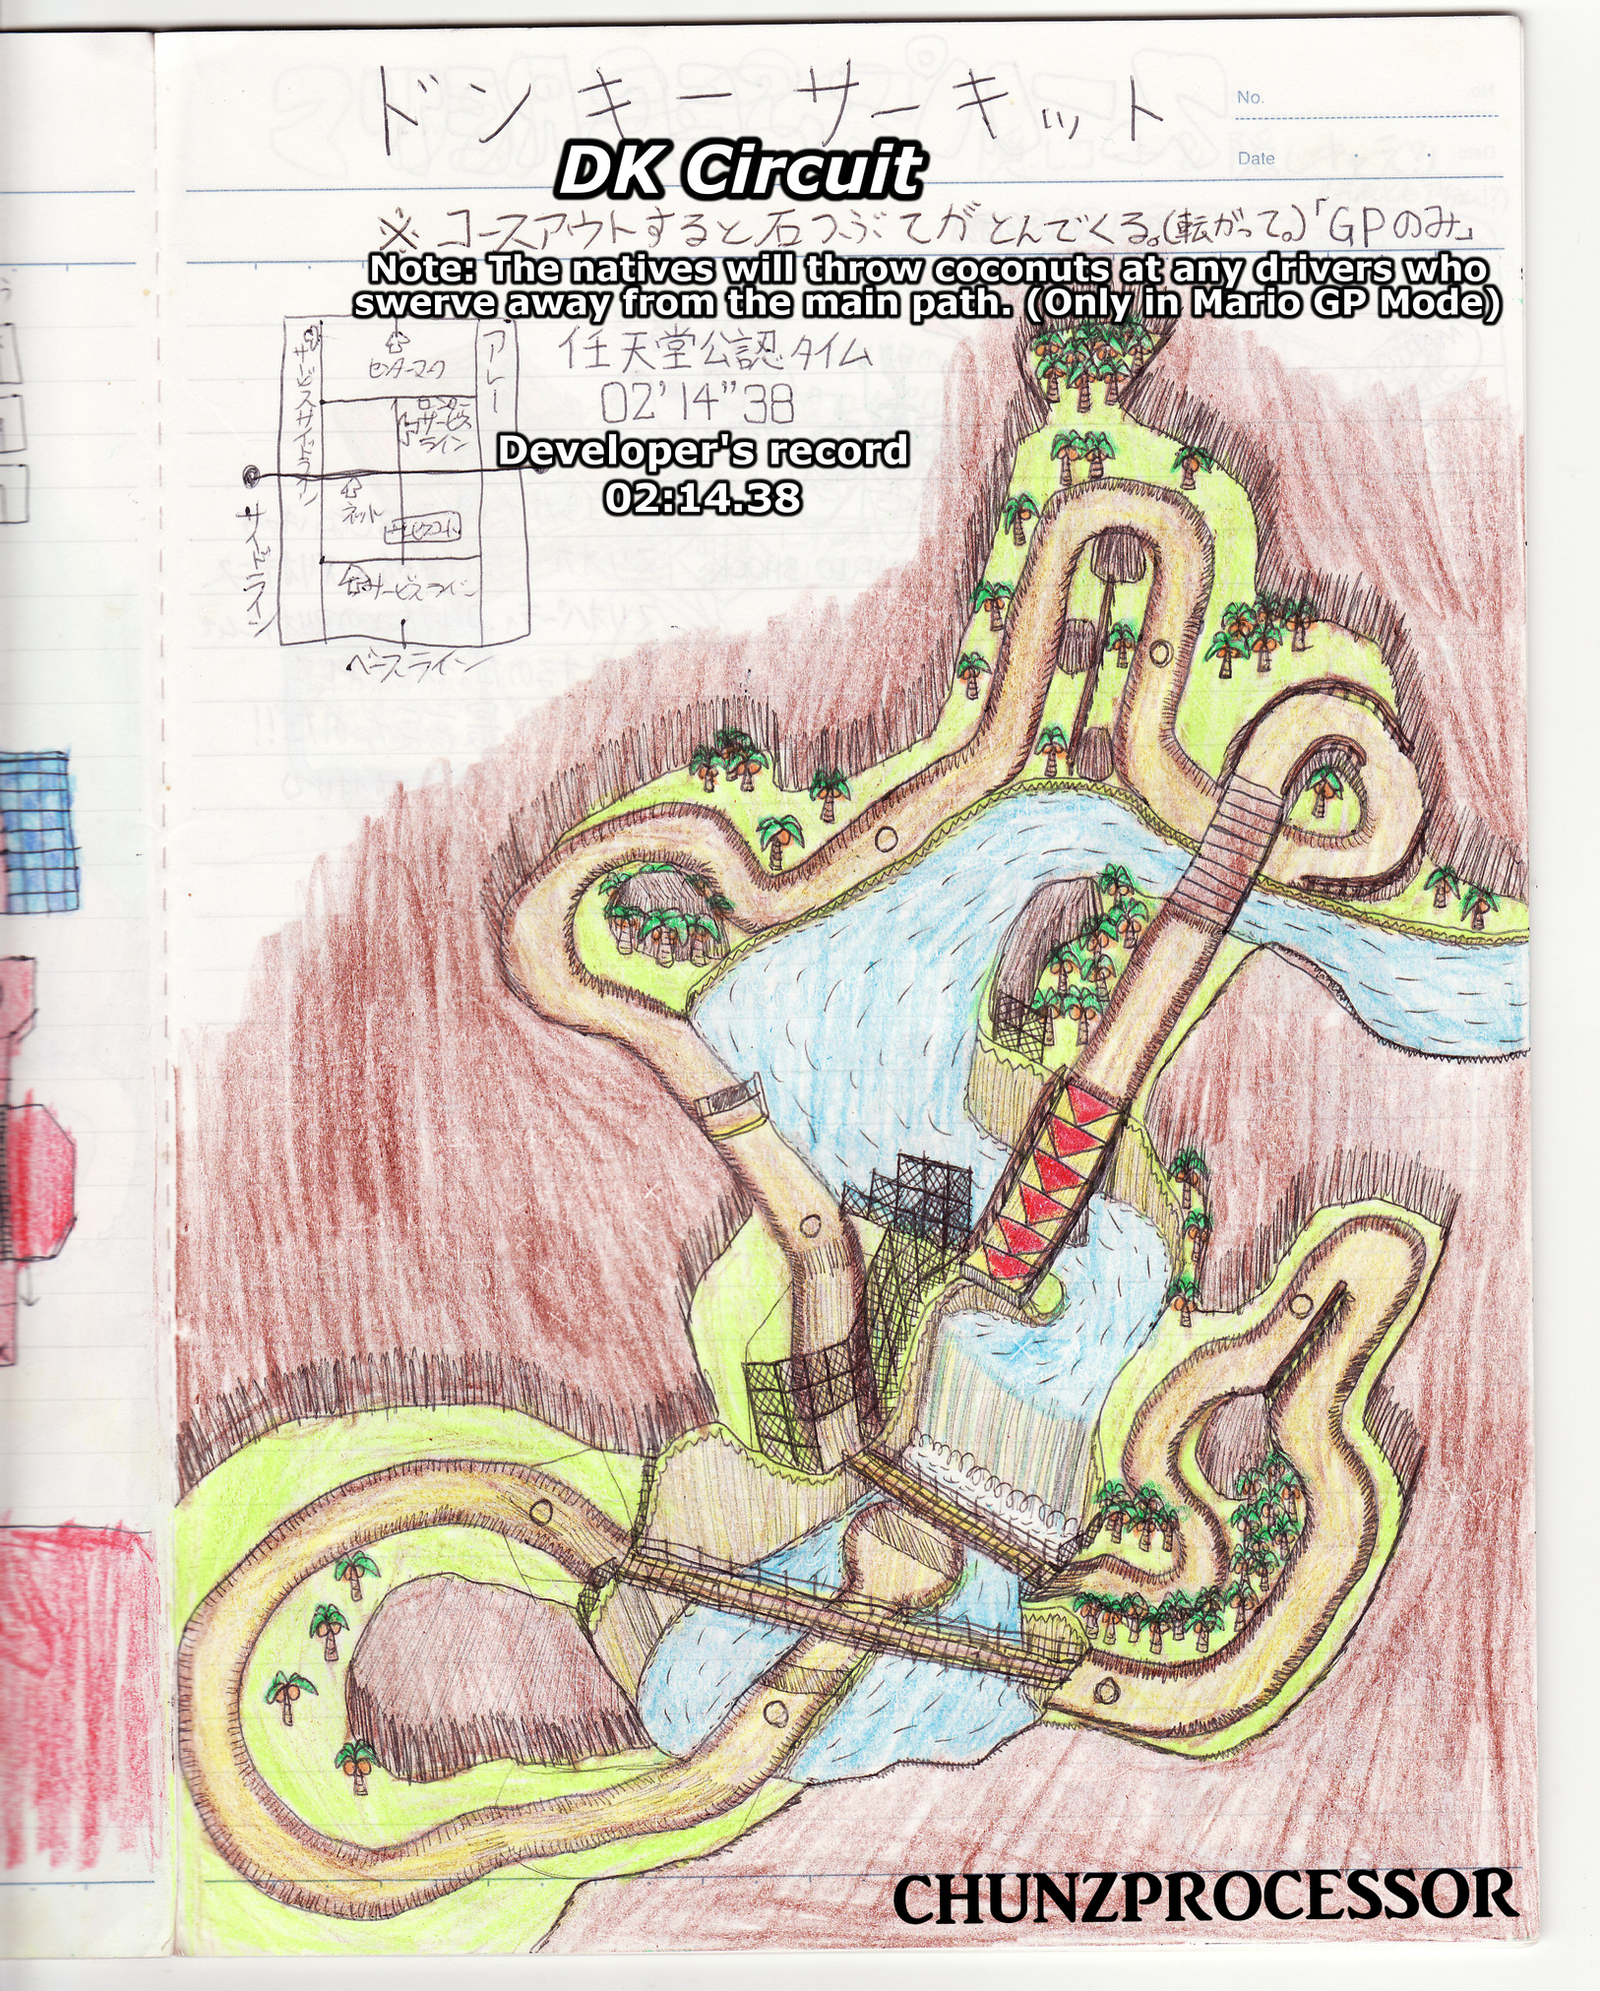 DK Circuit (My Original Race Track for Mario Kart) by chunzprocessor